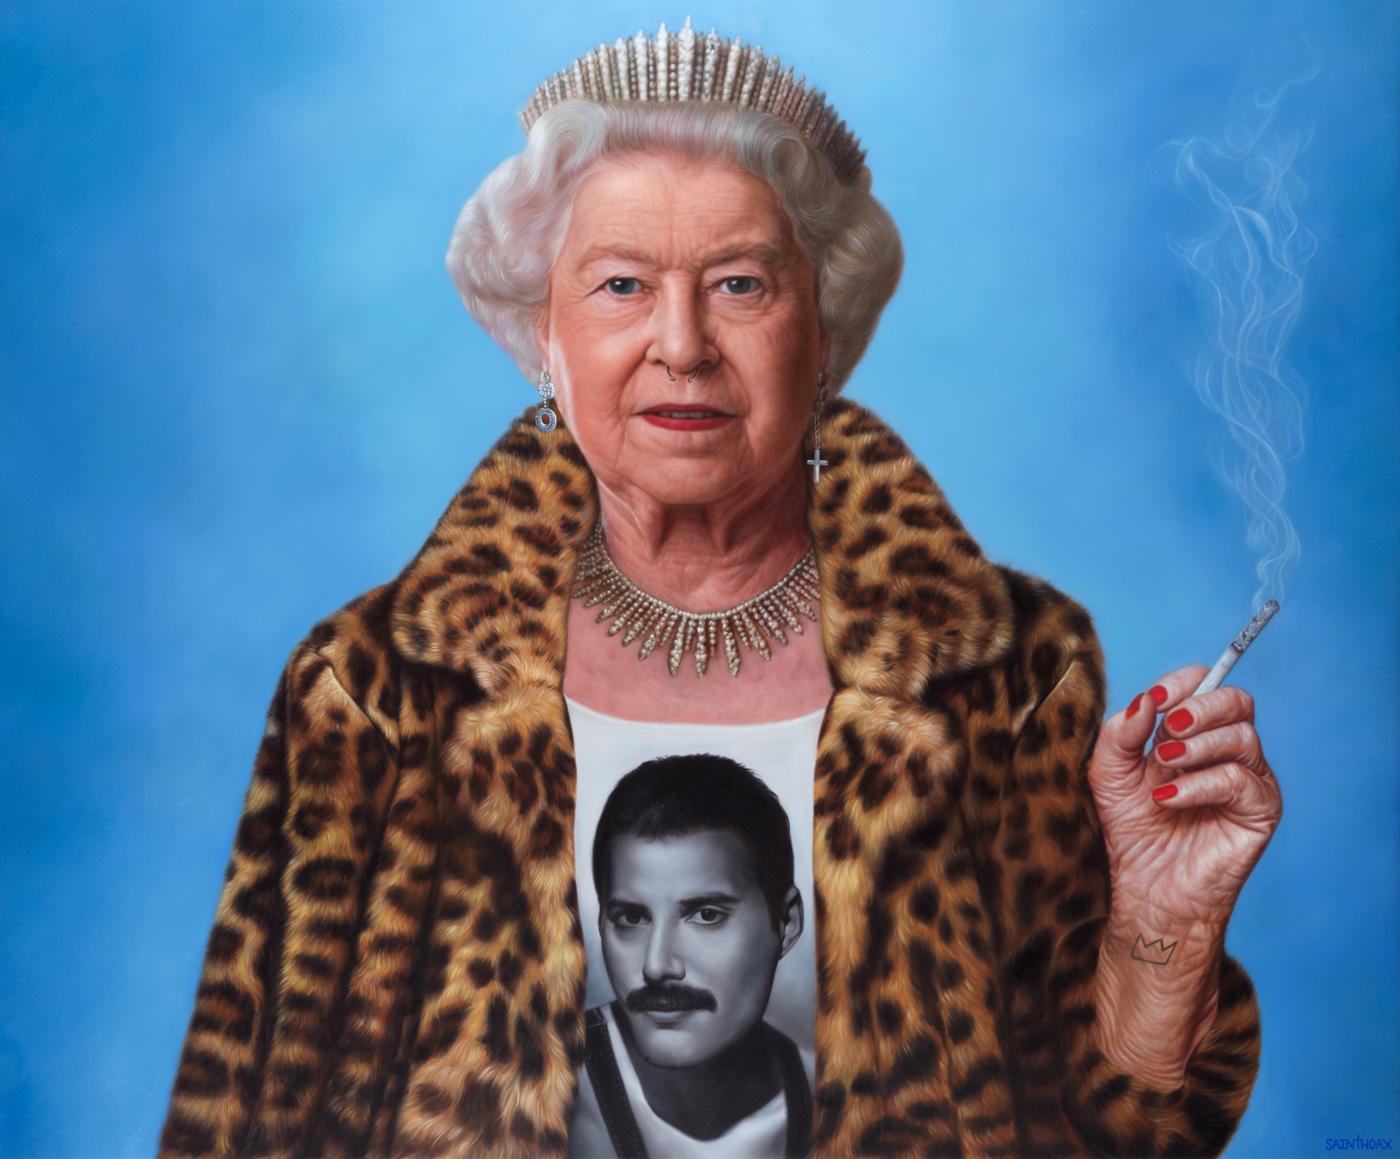 KILLER QUEEN - 2018Oil on canvas145 x 120 cm (57 x 47.2 in)$32,000